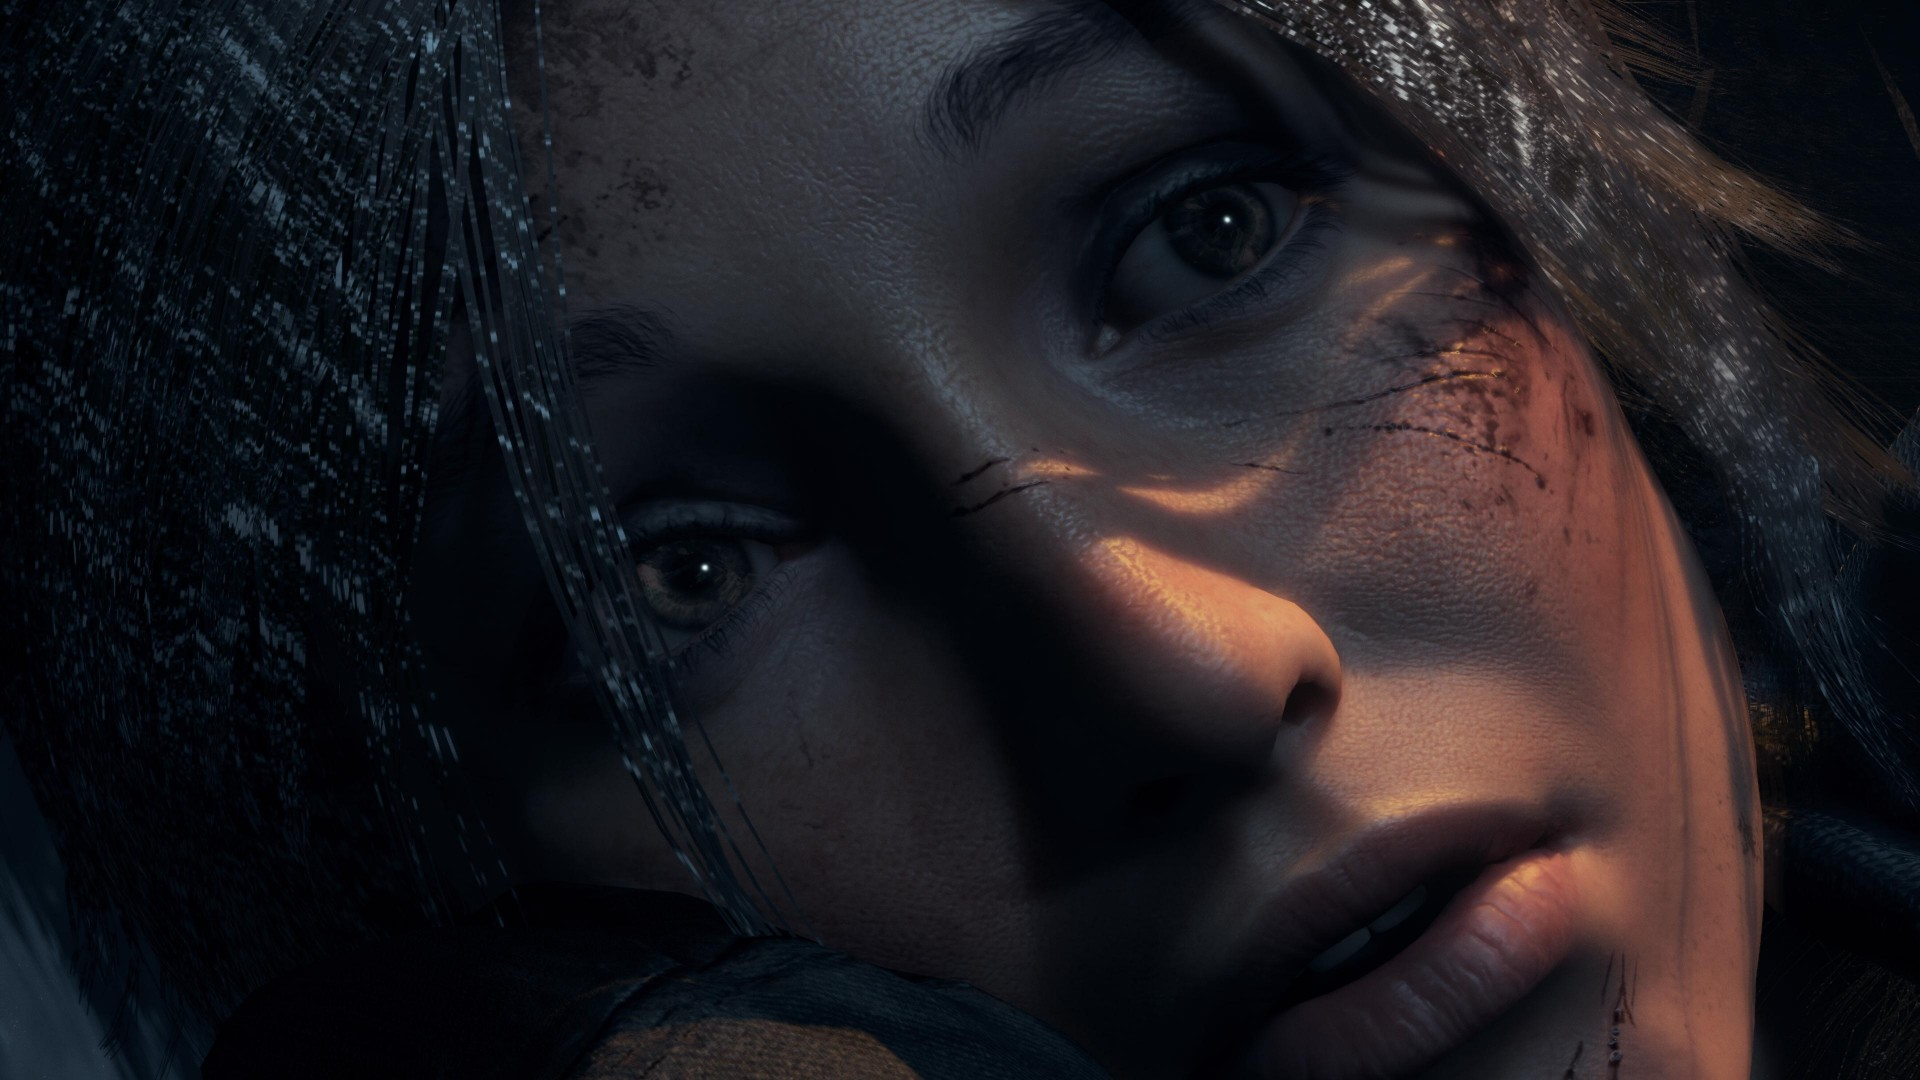 Wallpaper Rise Of The Tomb Raider Lara Croft Best Games Pc